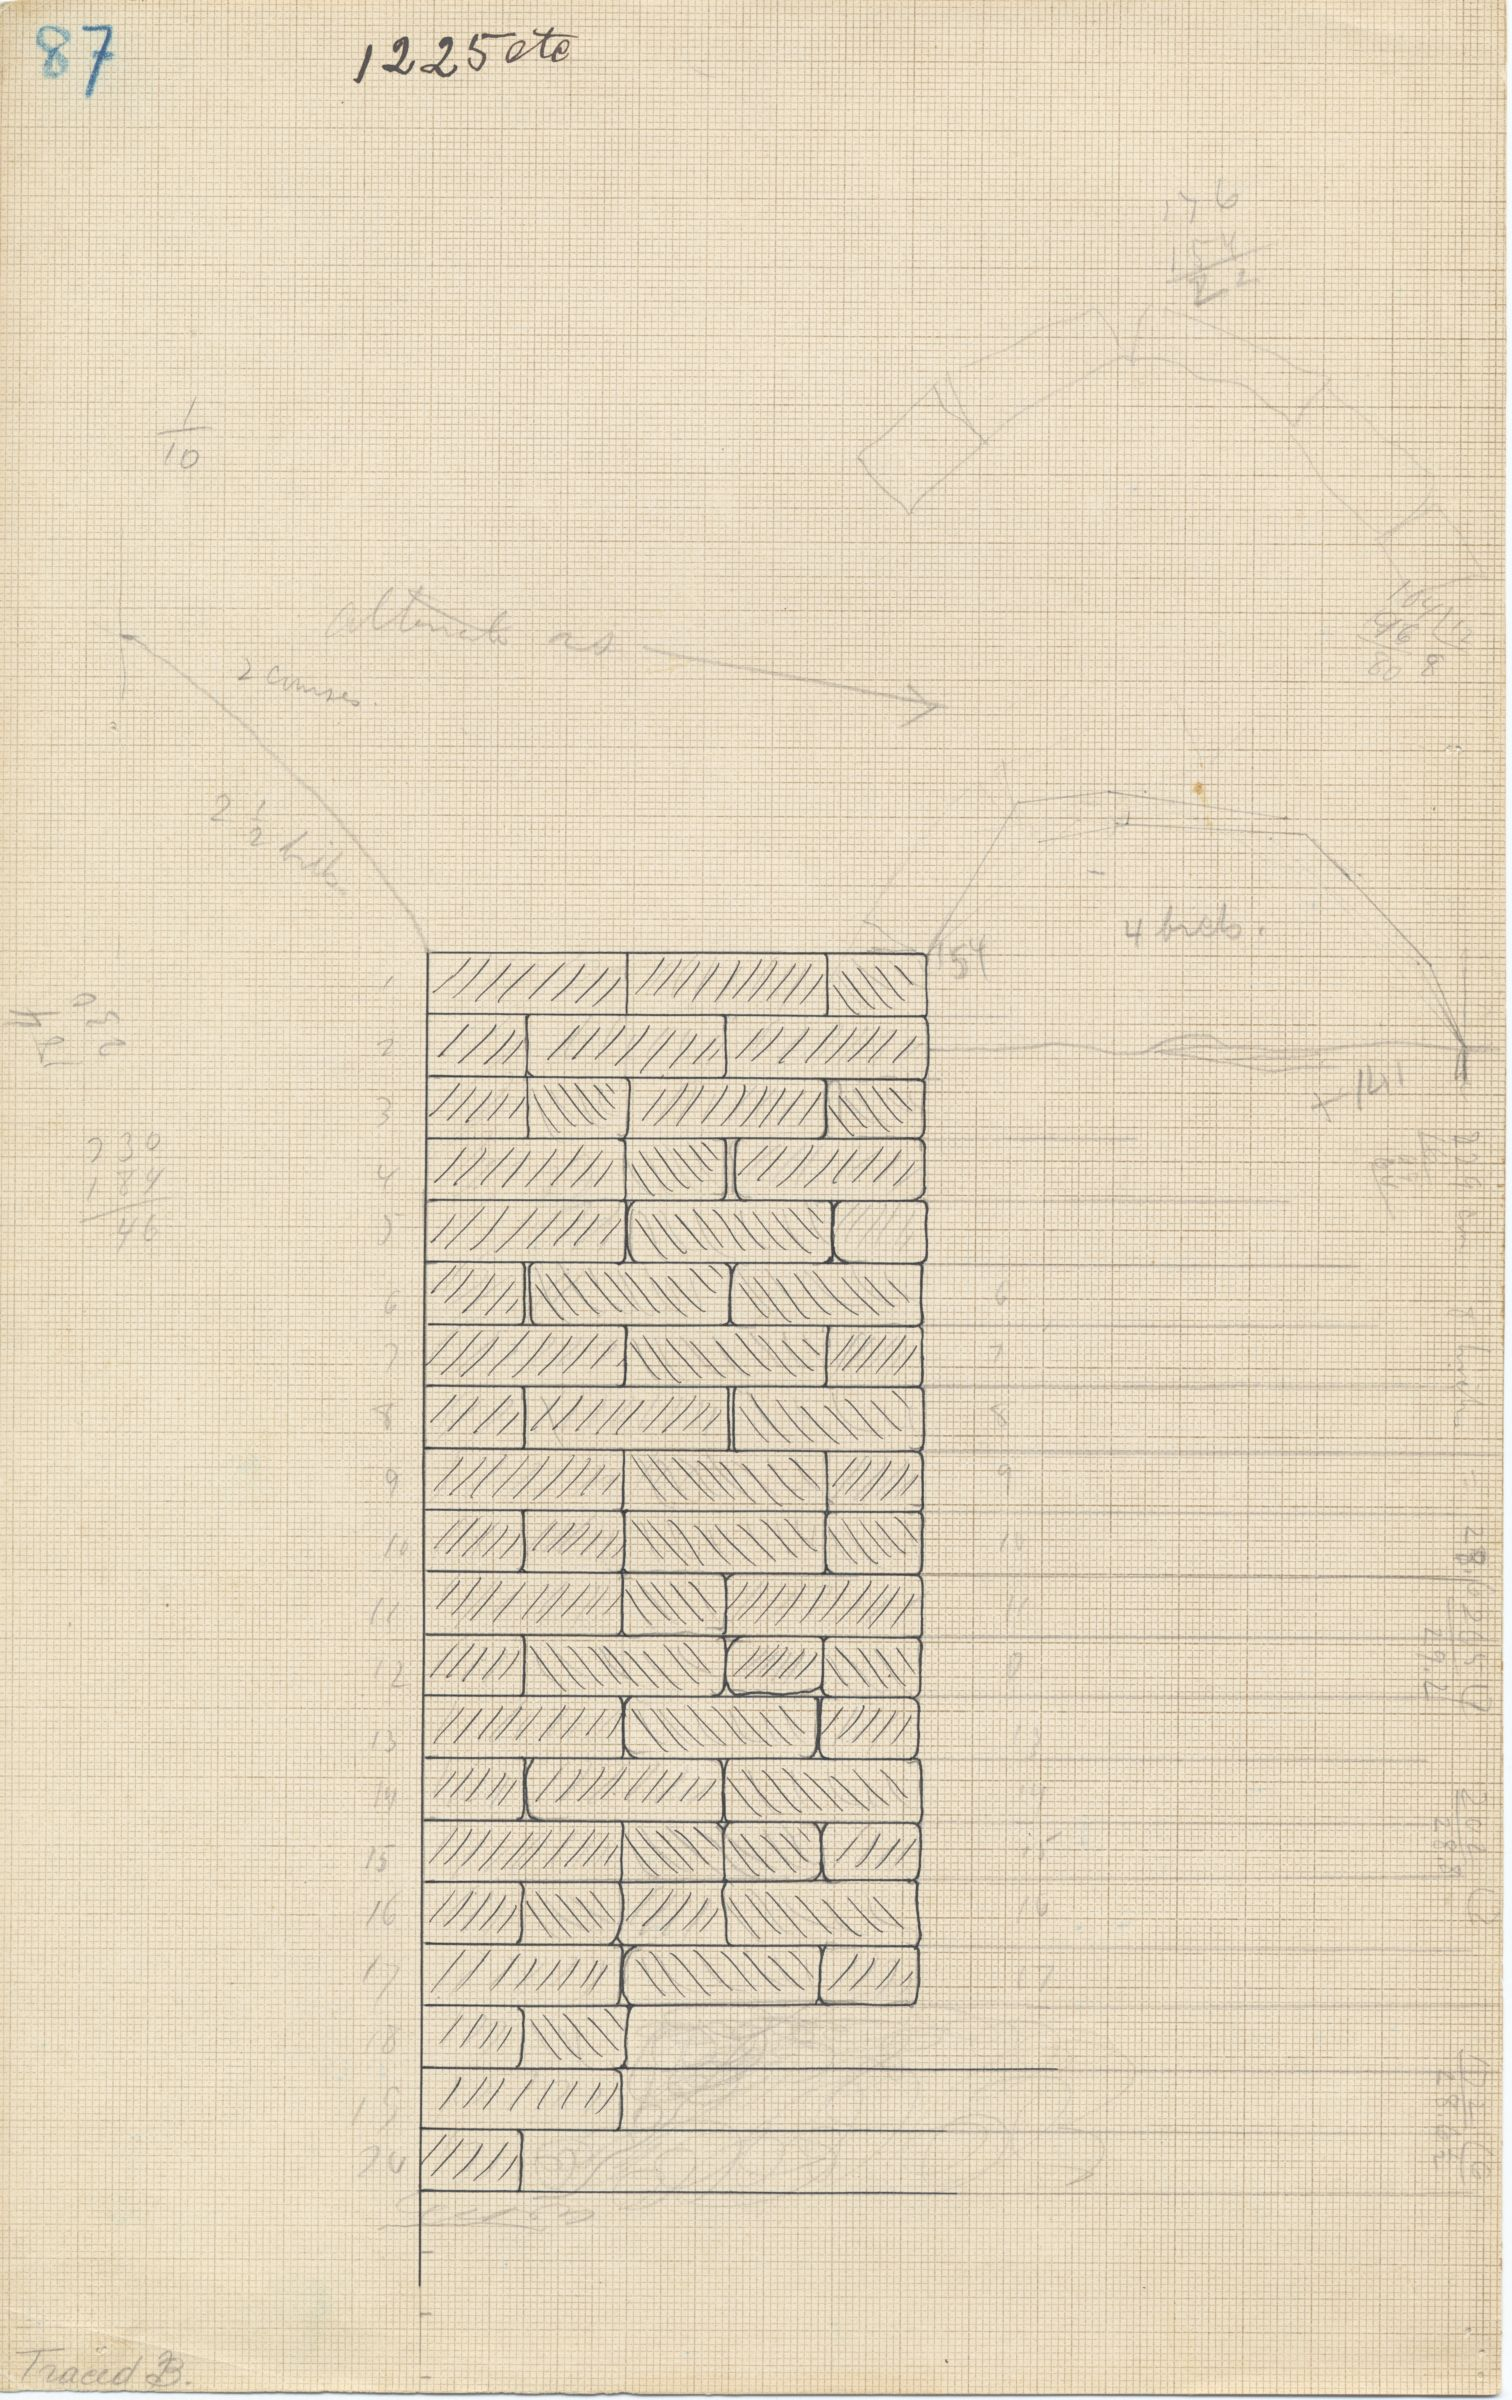 Maps and plans: G 1225-Annex, part of chapel mud brick vault